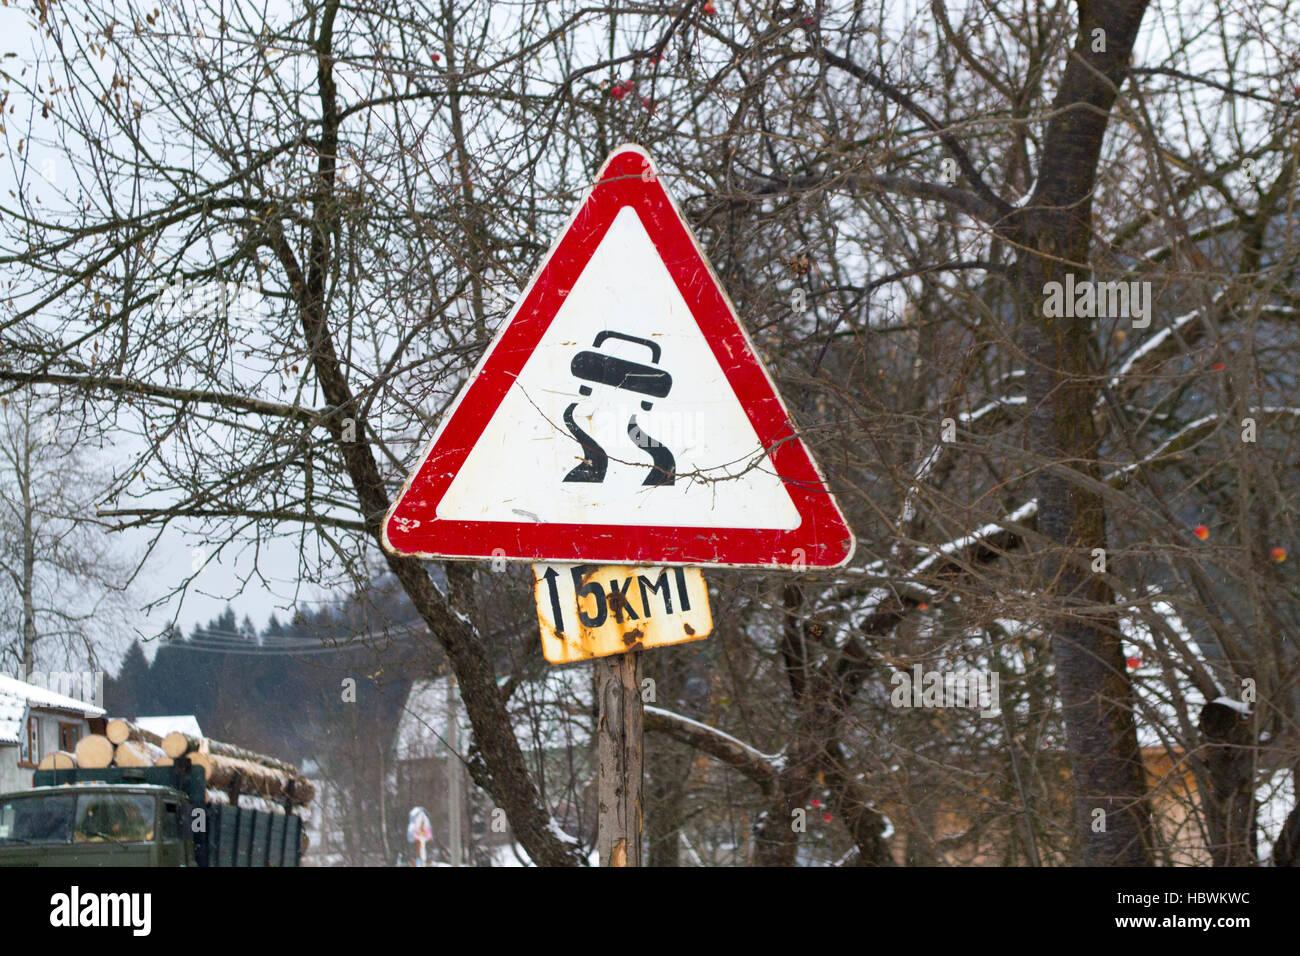 Road sign winter slipper road - Stock Image